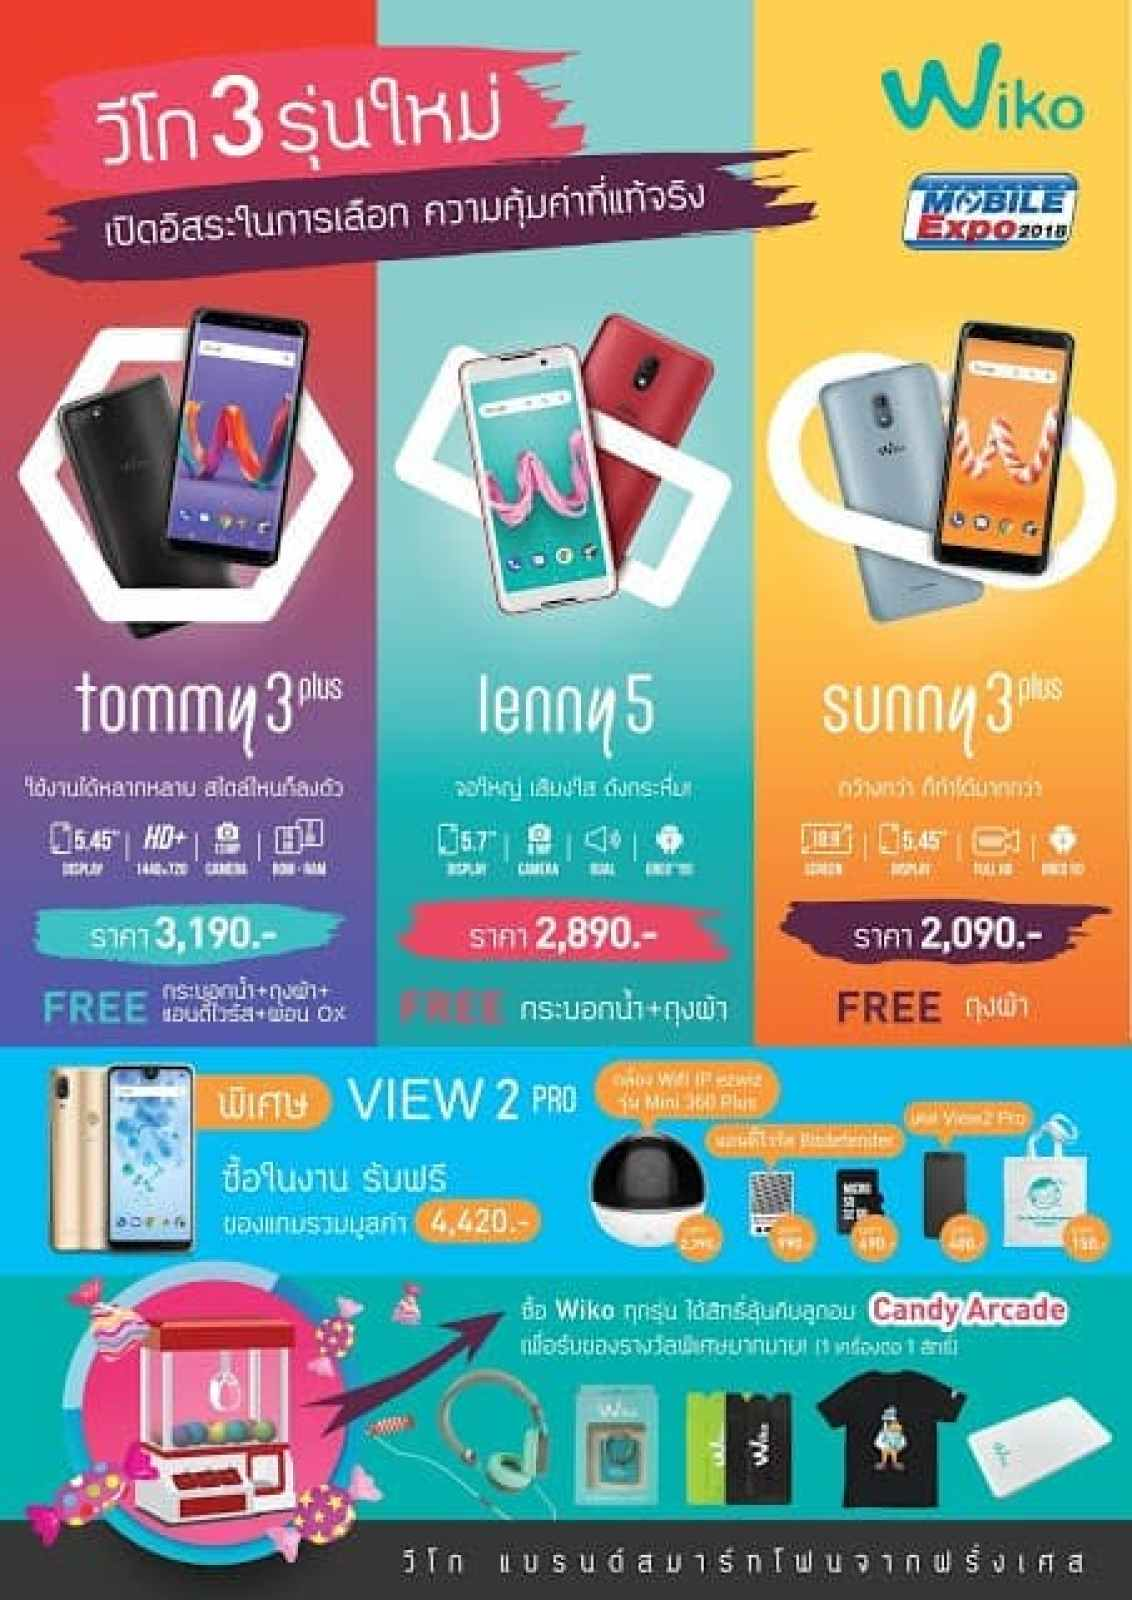 - Wiko promotion for TME2018 2 - Wiko เปิดตัวสมาร์ทโฟน 3 รุ่นใหม่ในงานThailand Mobile Expo 2018 ตอบโจทย์ความคุ้มค่าในราคาสุดคุ้ม